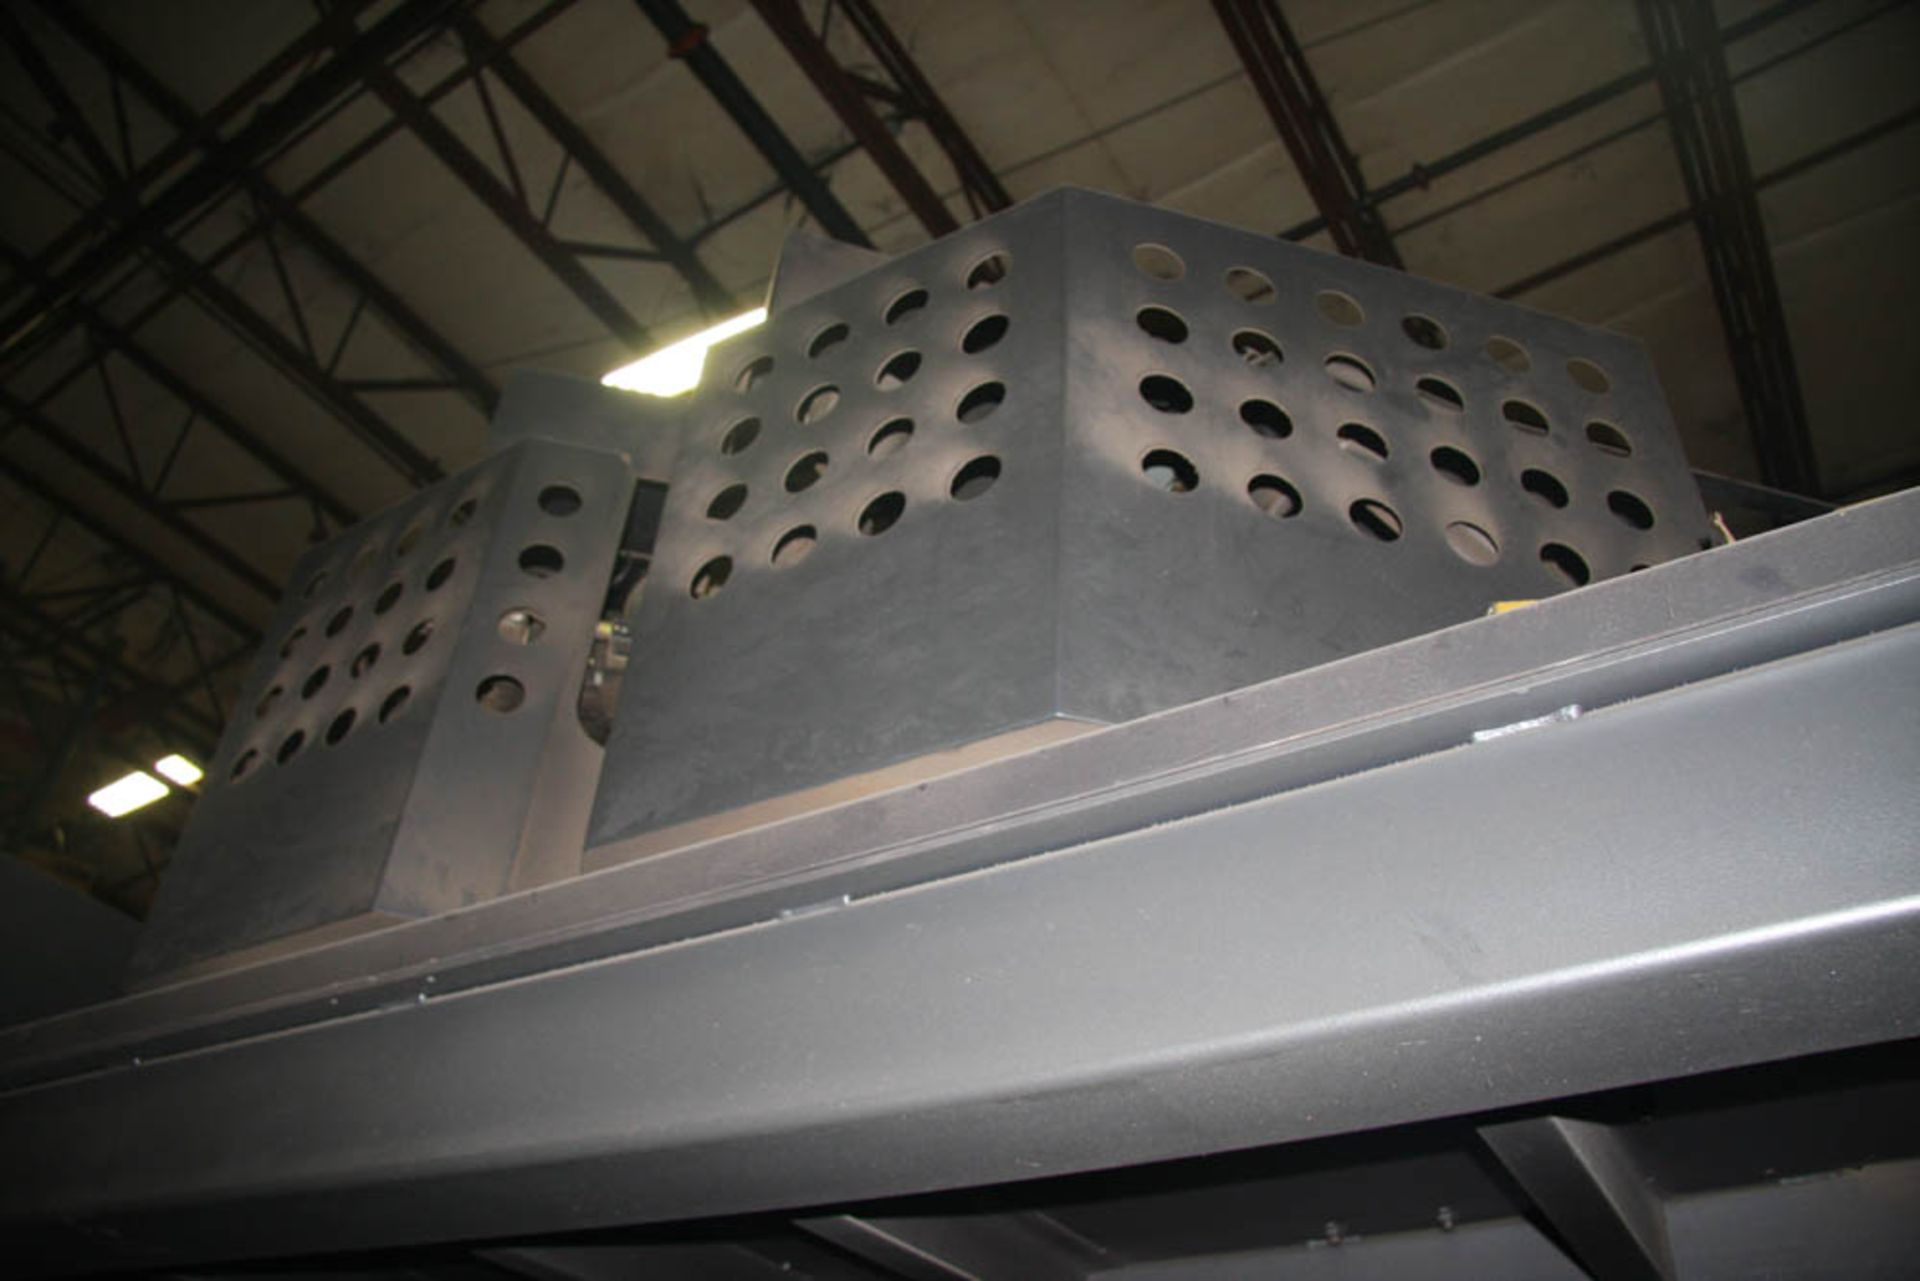 "2015 187 US TON X 122"" AMADA MDL. HG1703 CNC PRESS BRAKE, AMNC 3i CONTROL, 122"" MAX BEND LENGTH - Image 13 of 14"